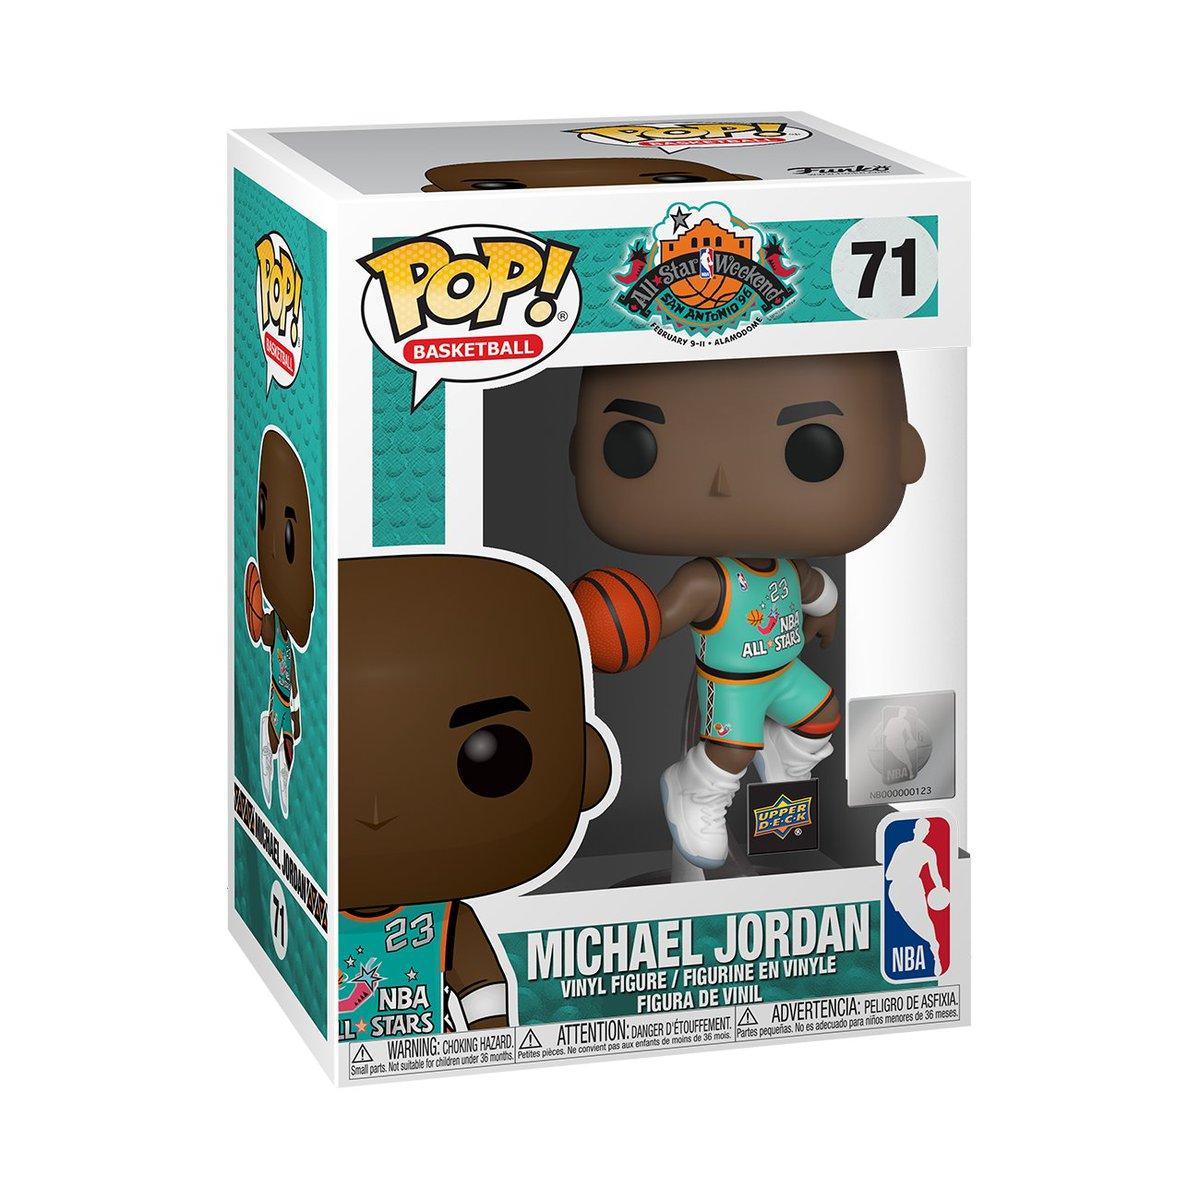 RT & follow @OriginalFunko for a chance to WIN a @UpperDeckSports exclusive Michael Jordan Pop!  #Funko #FunkoPop #Pop #Giveaway #exclusive #MJ #MJMondays #HBD #MichaelJordan #AllStar